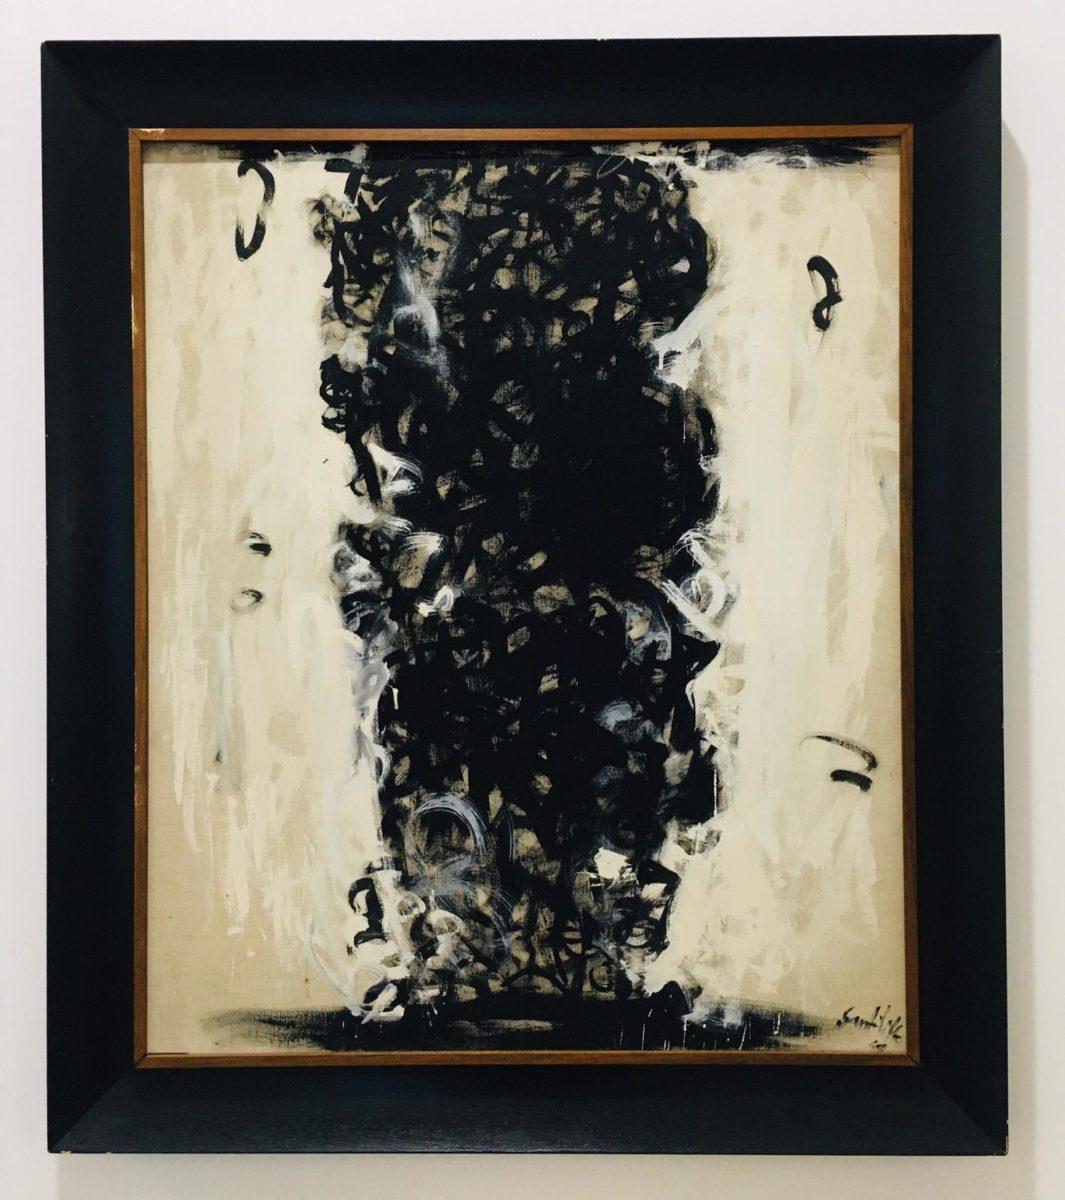 Sanfilippo, Arcaico, 1959, acrilico su tela, cm 97x81